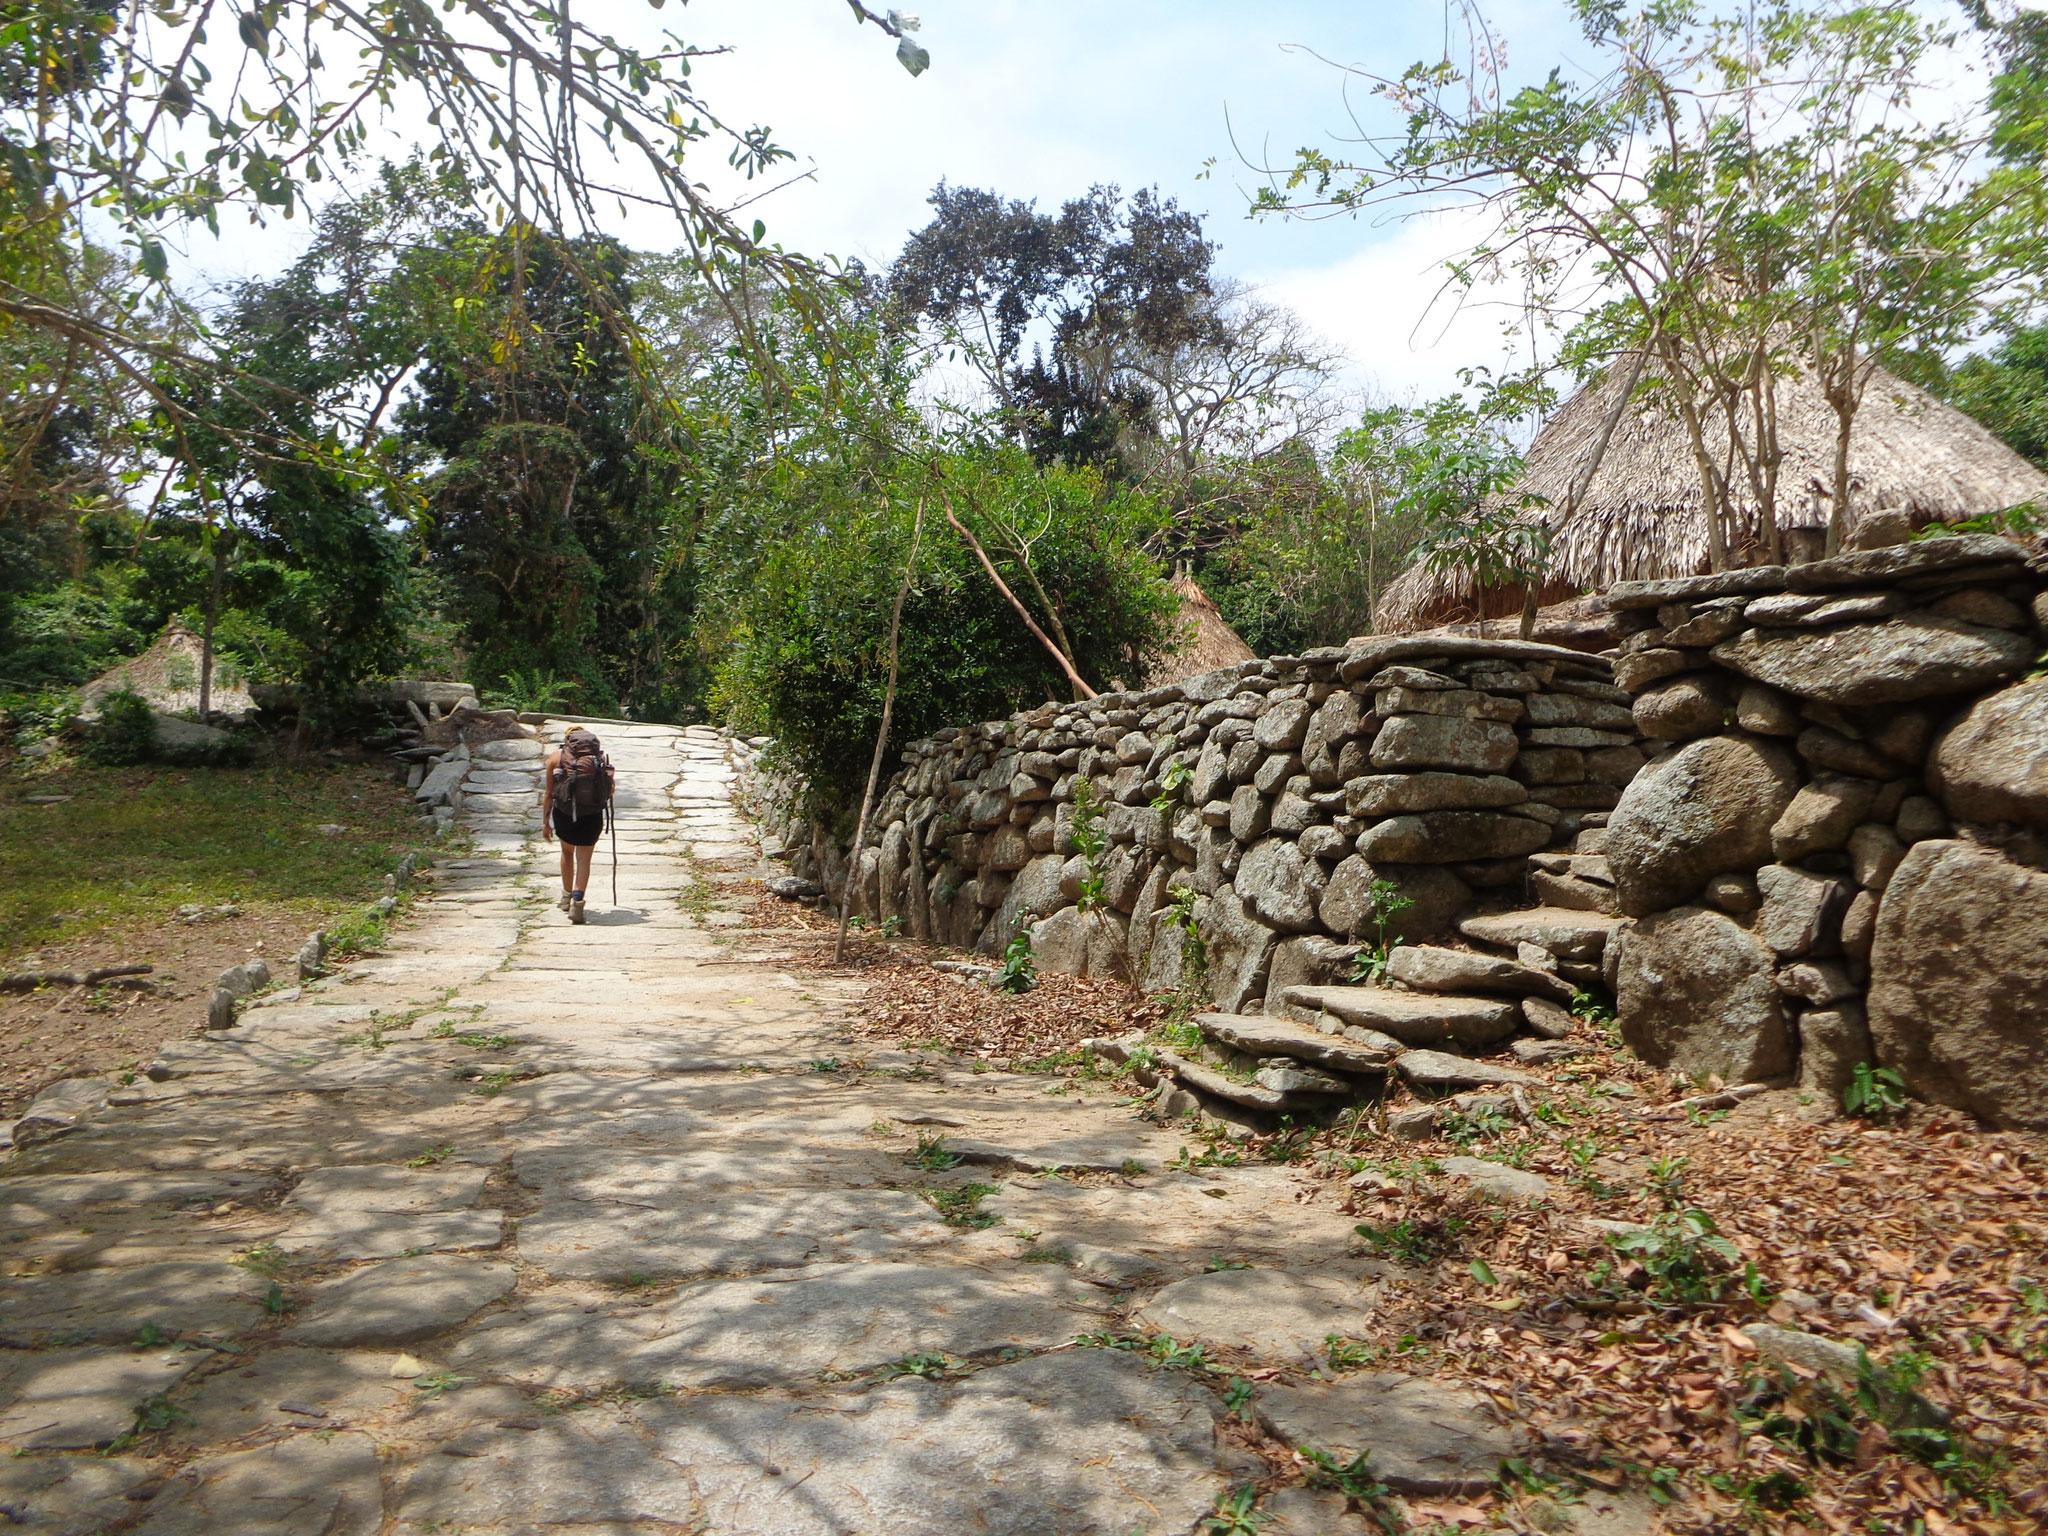 Les villages indigènes